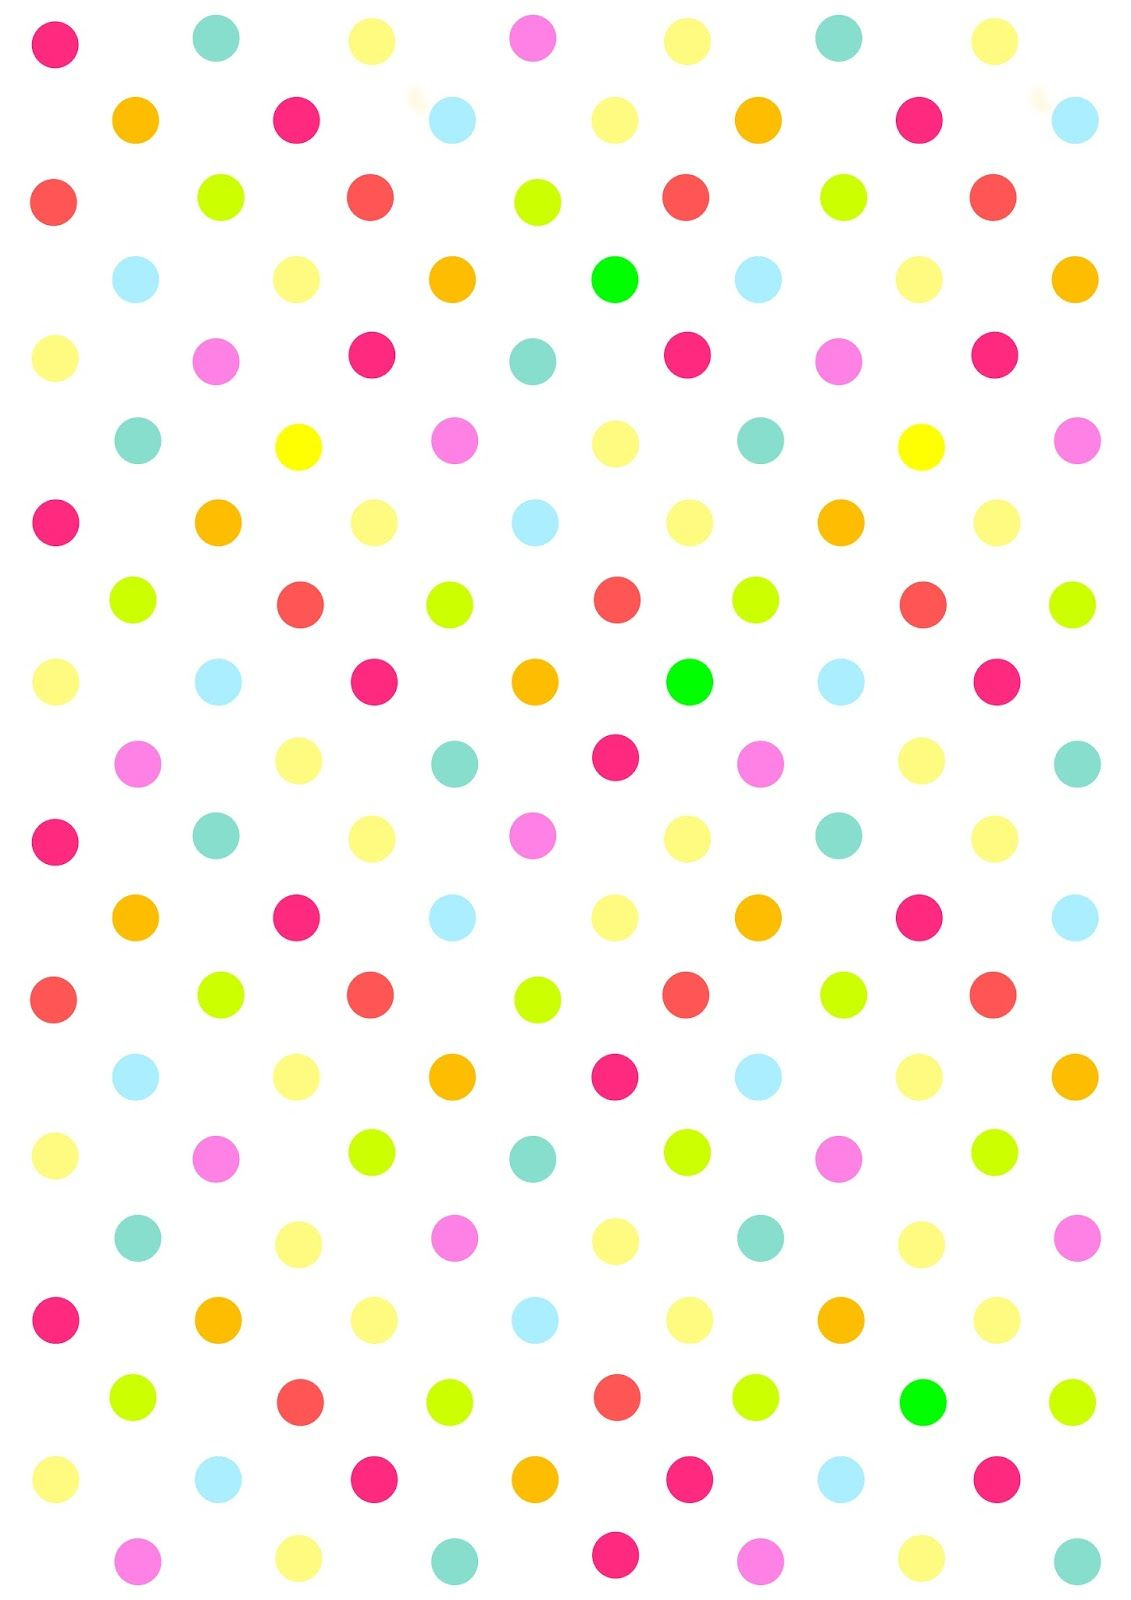 Free Digital Multicolored Polka Dot Scrapbooking Paper - Free Printable Pink Polka Dot Paper